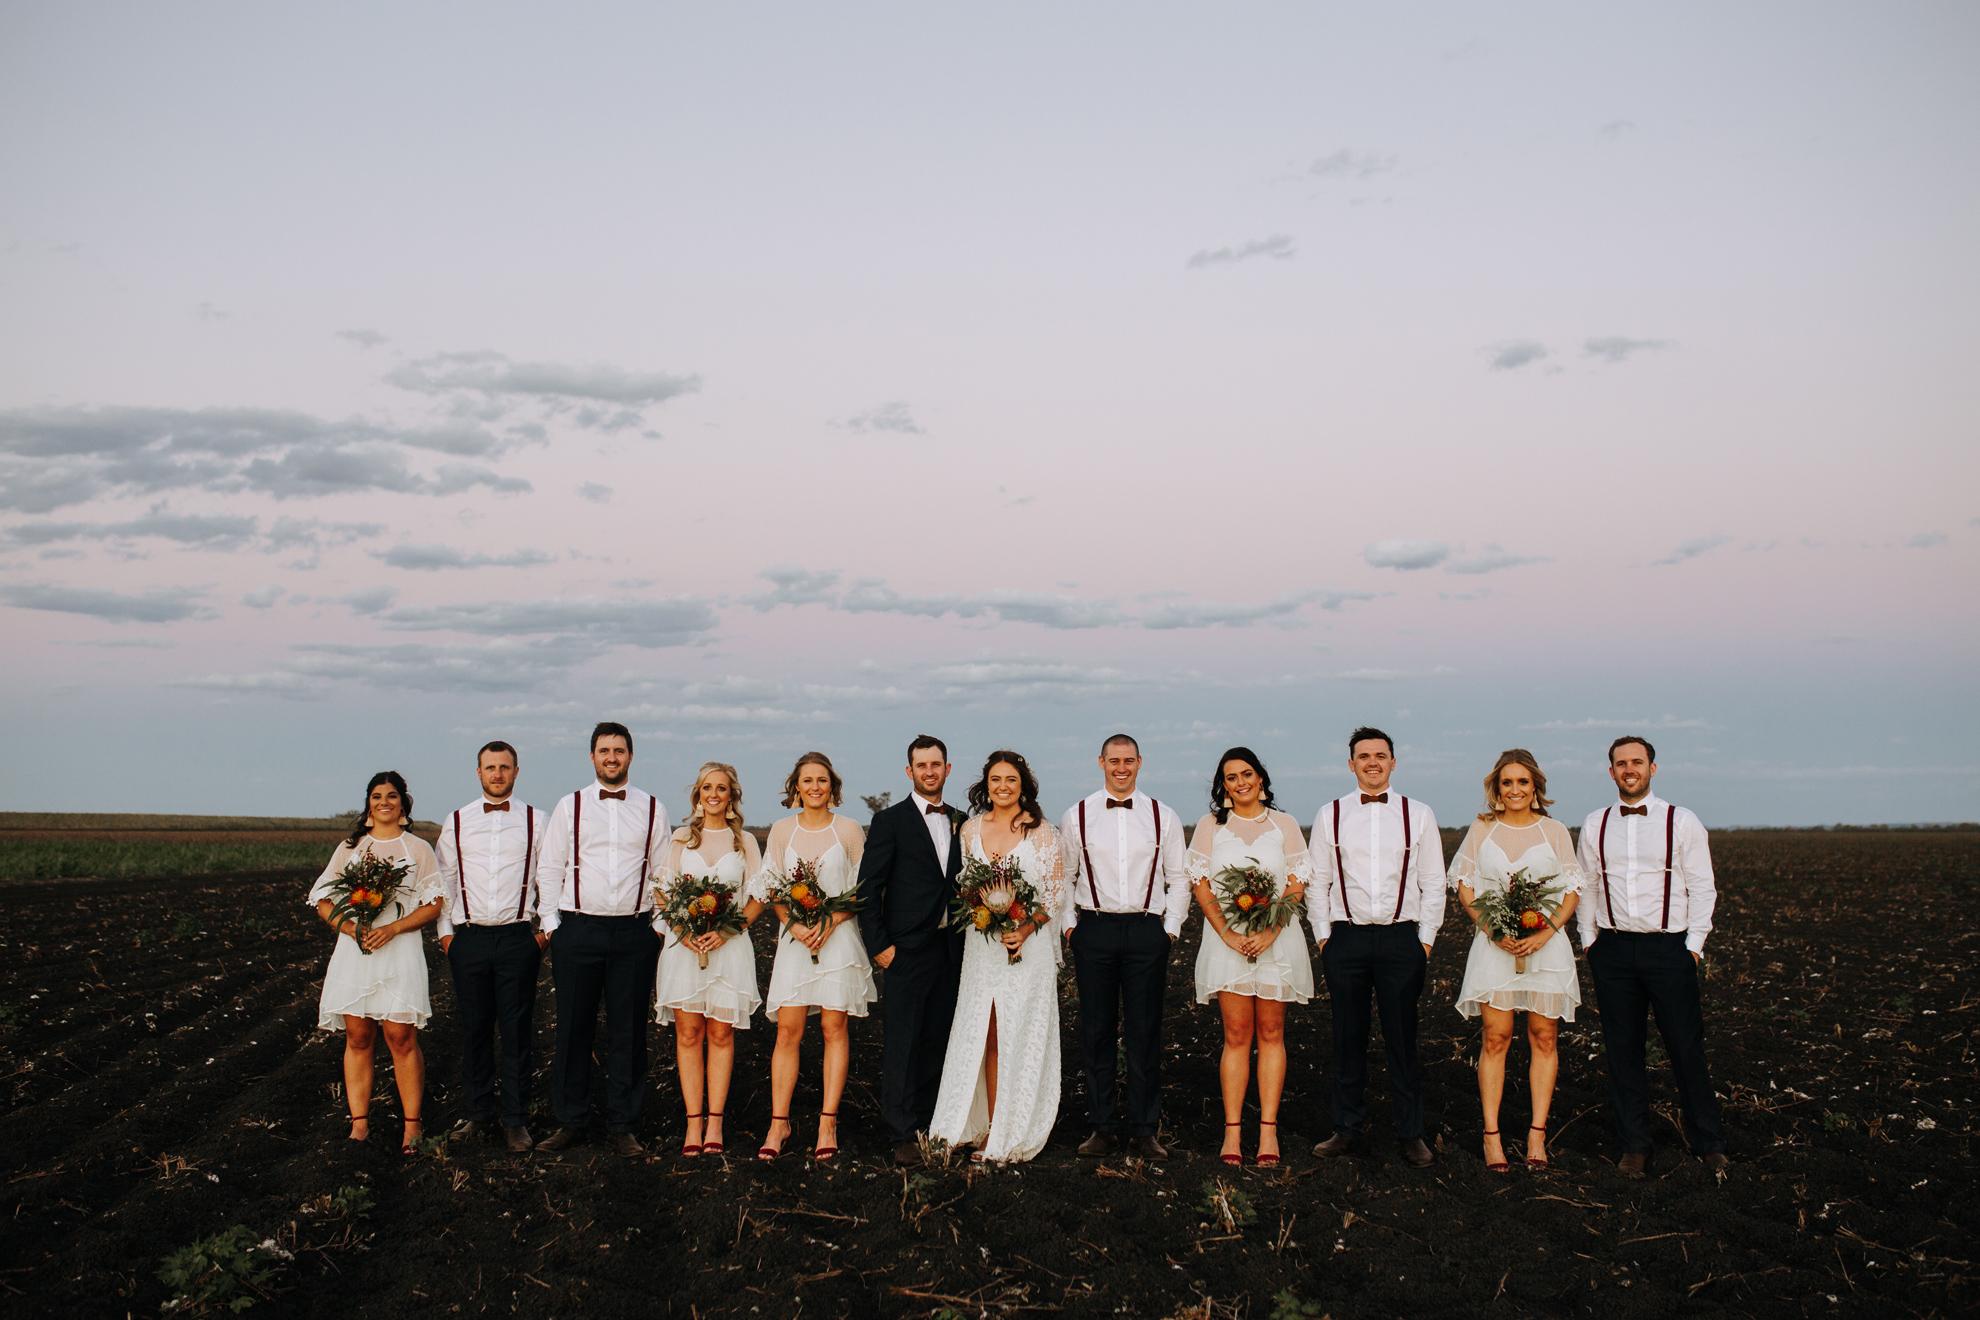 078-Jason_Jessie_Dalby_Country_Wedding.jpg